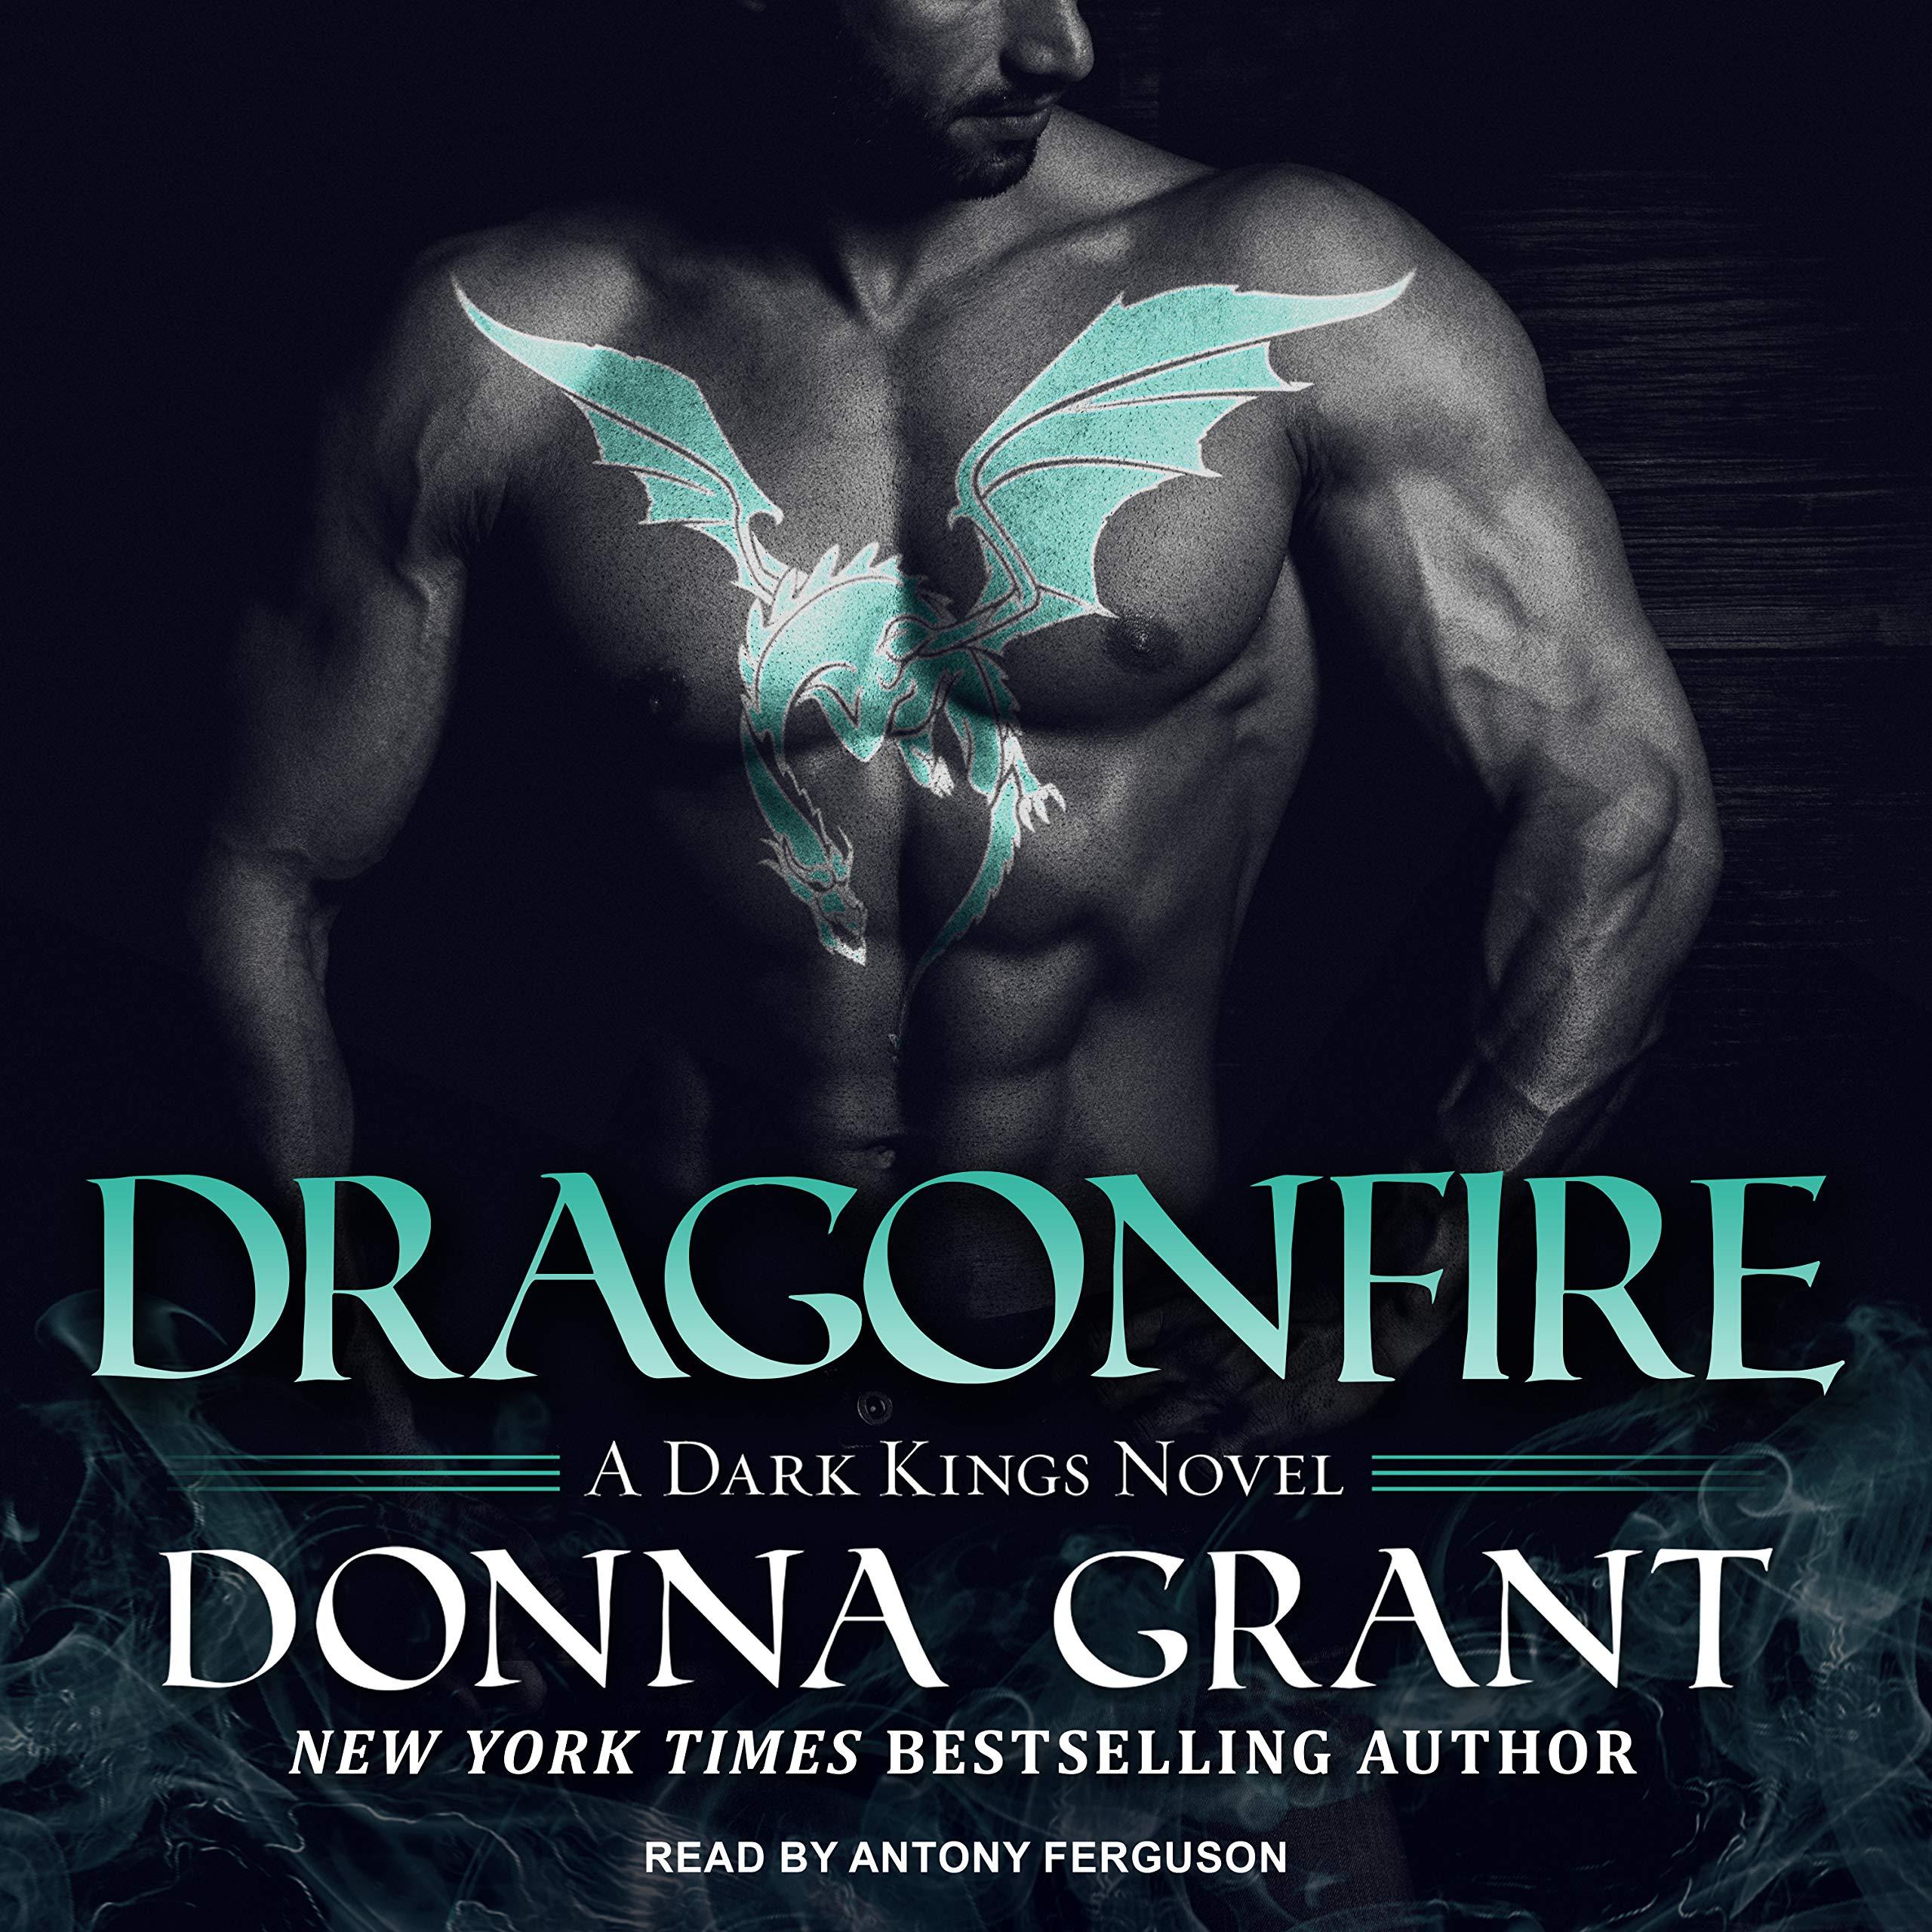 Dragonfire (Dark Kings) by Tantor Audio